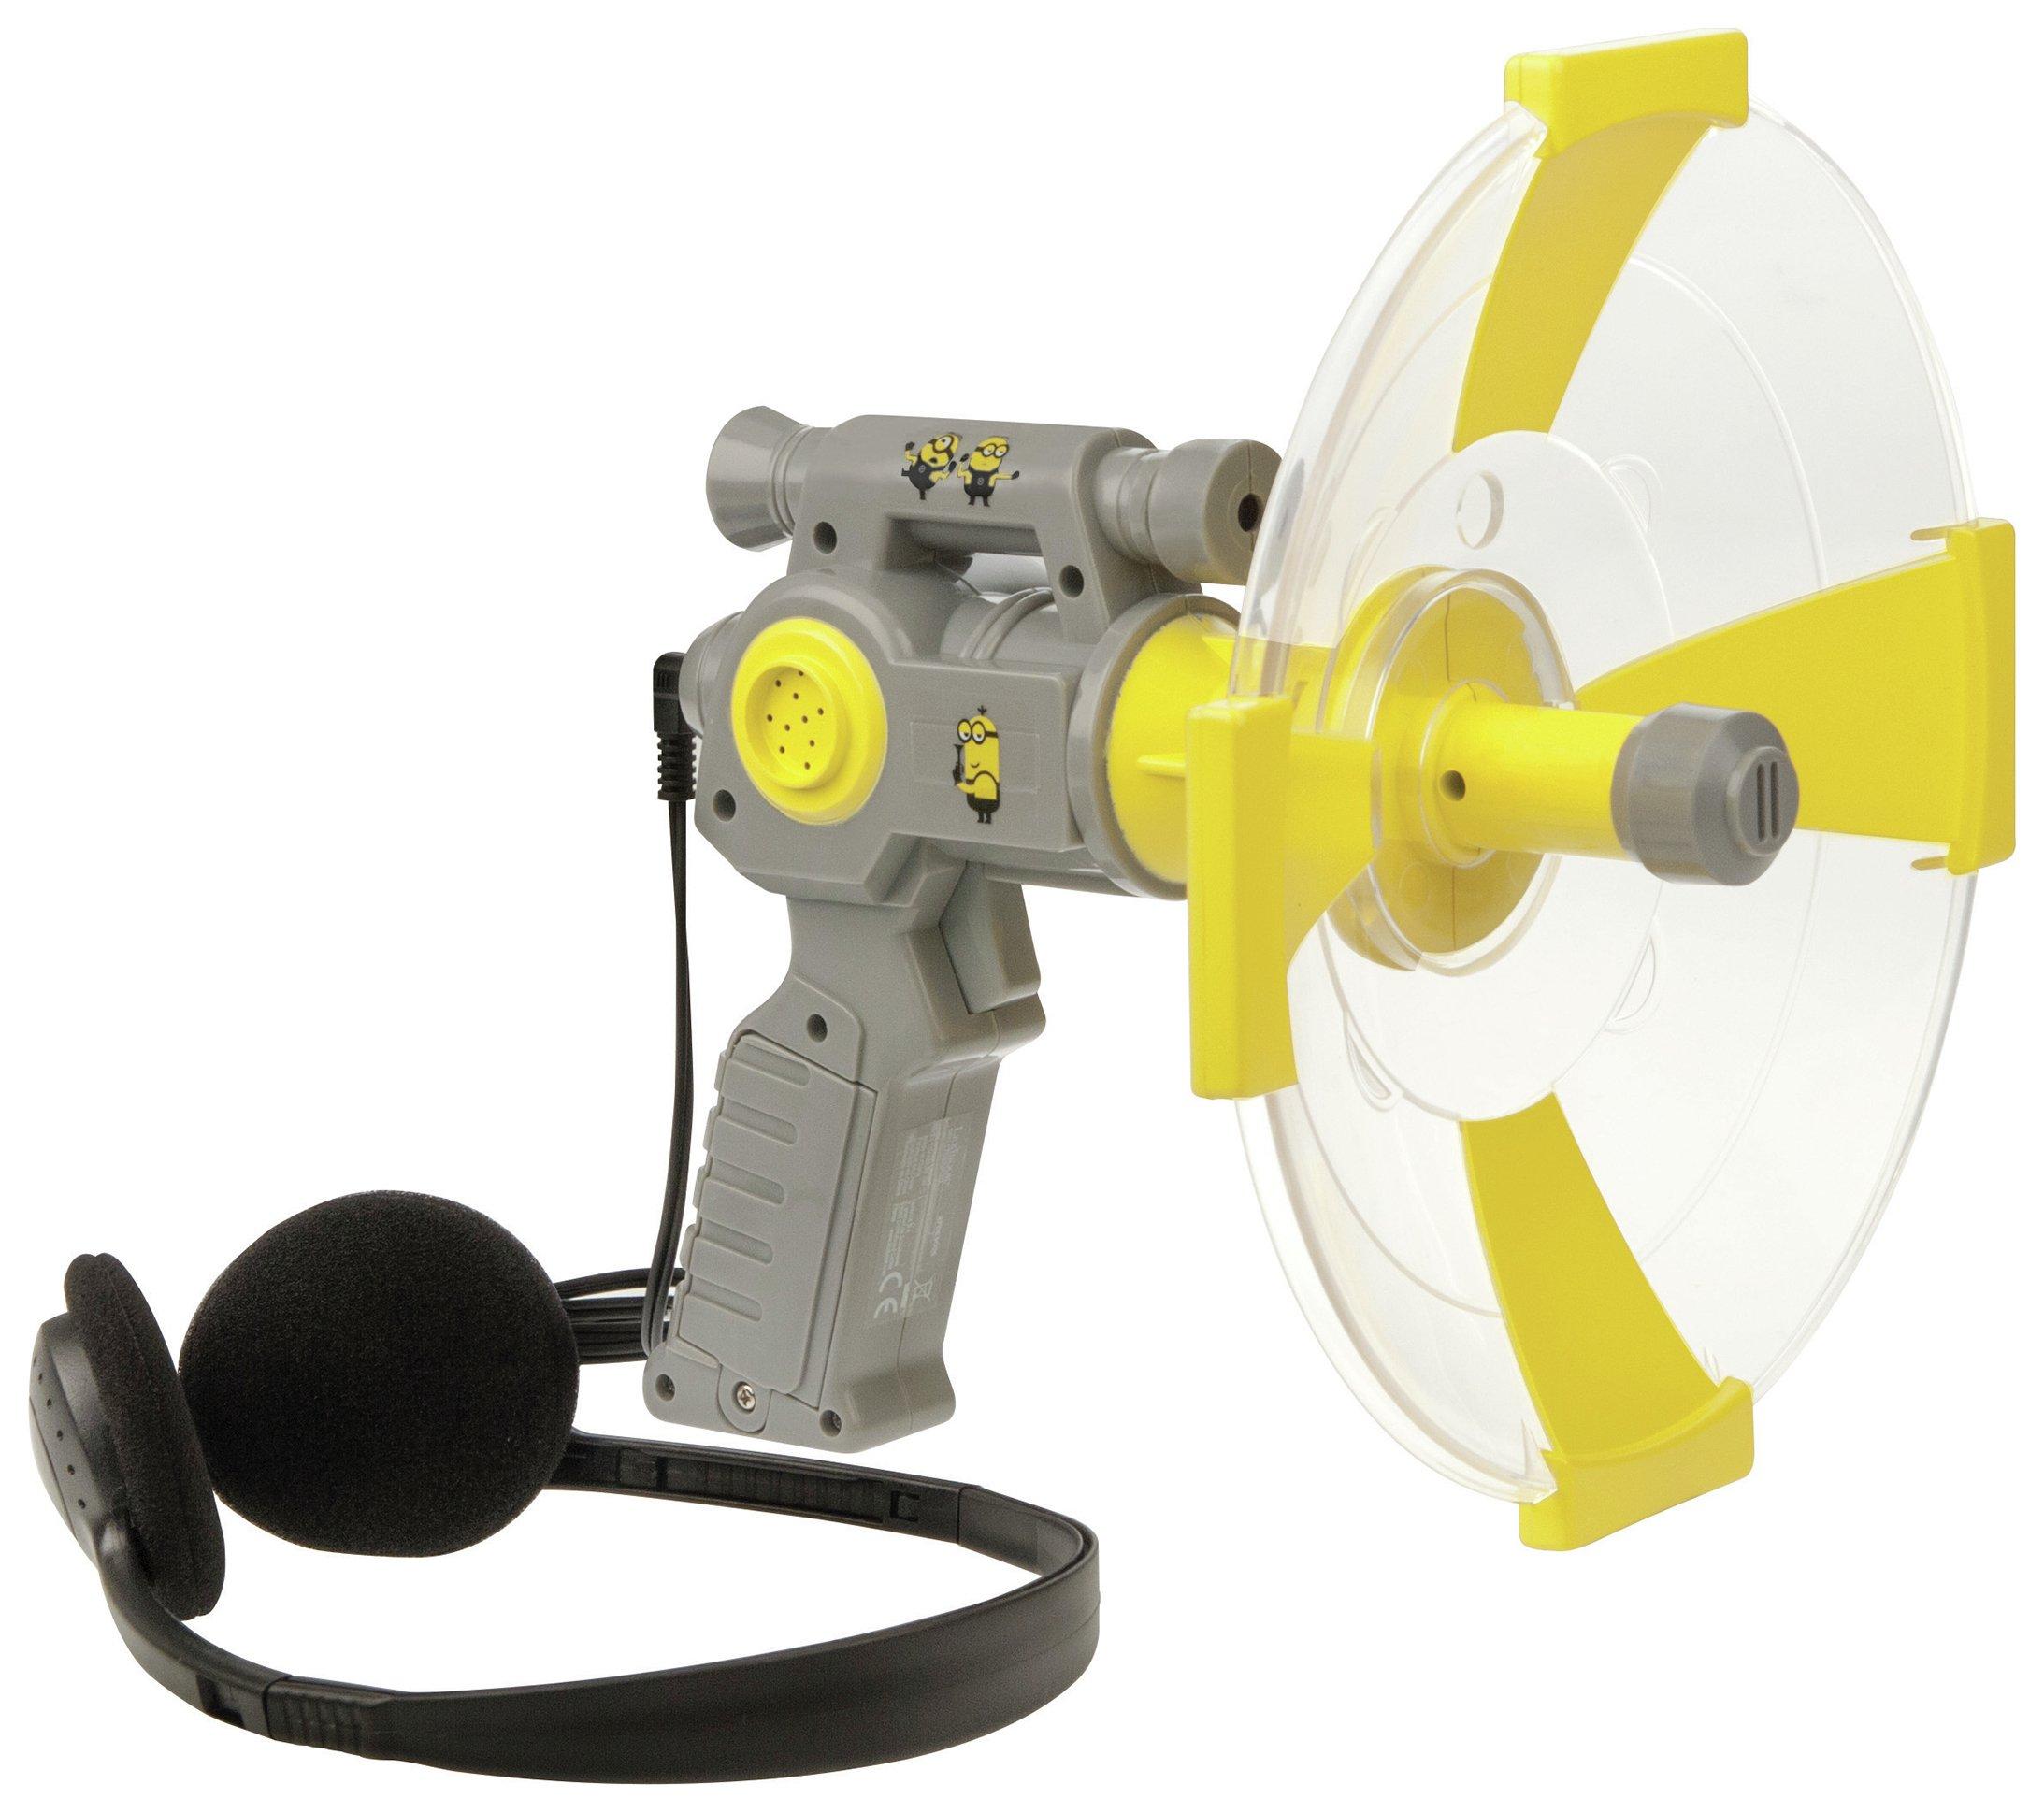 Image of Despicable Me Sound Amplifier.